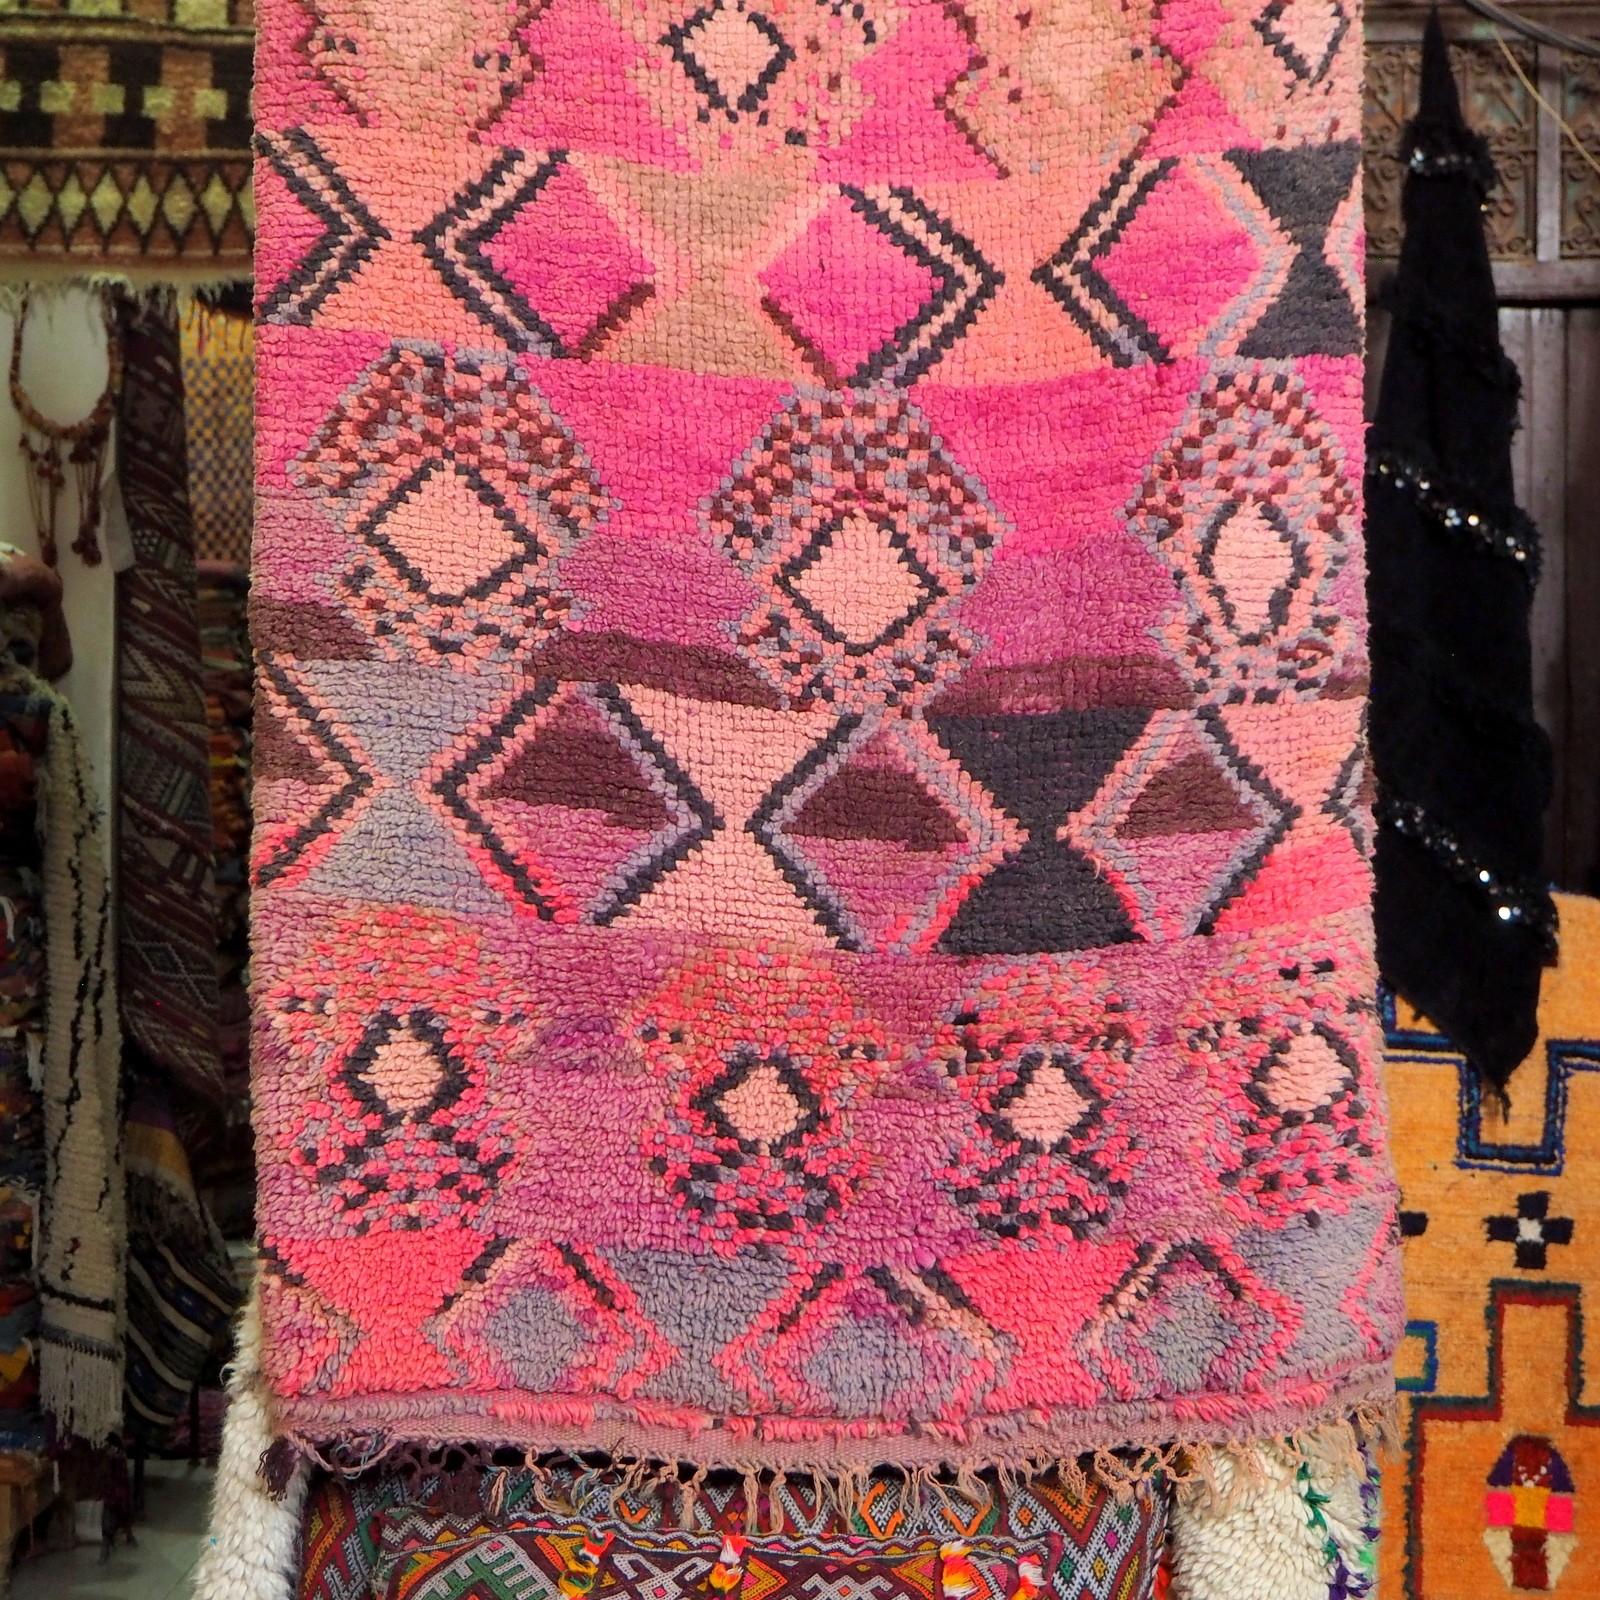 Marrakesh medina carpets Marrakeshin medina